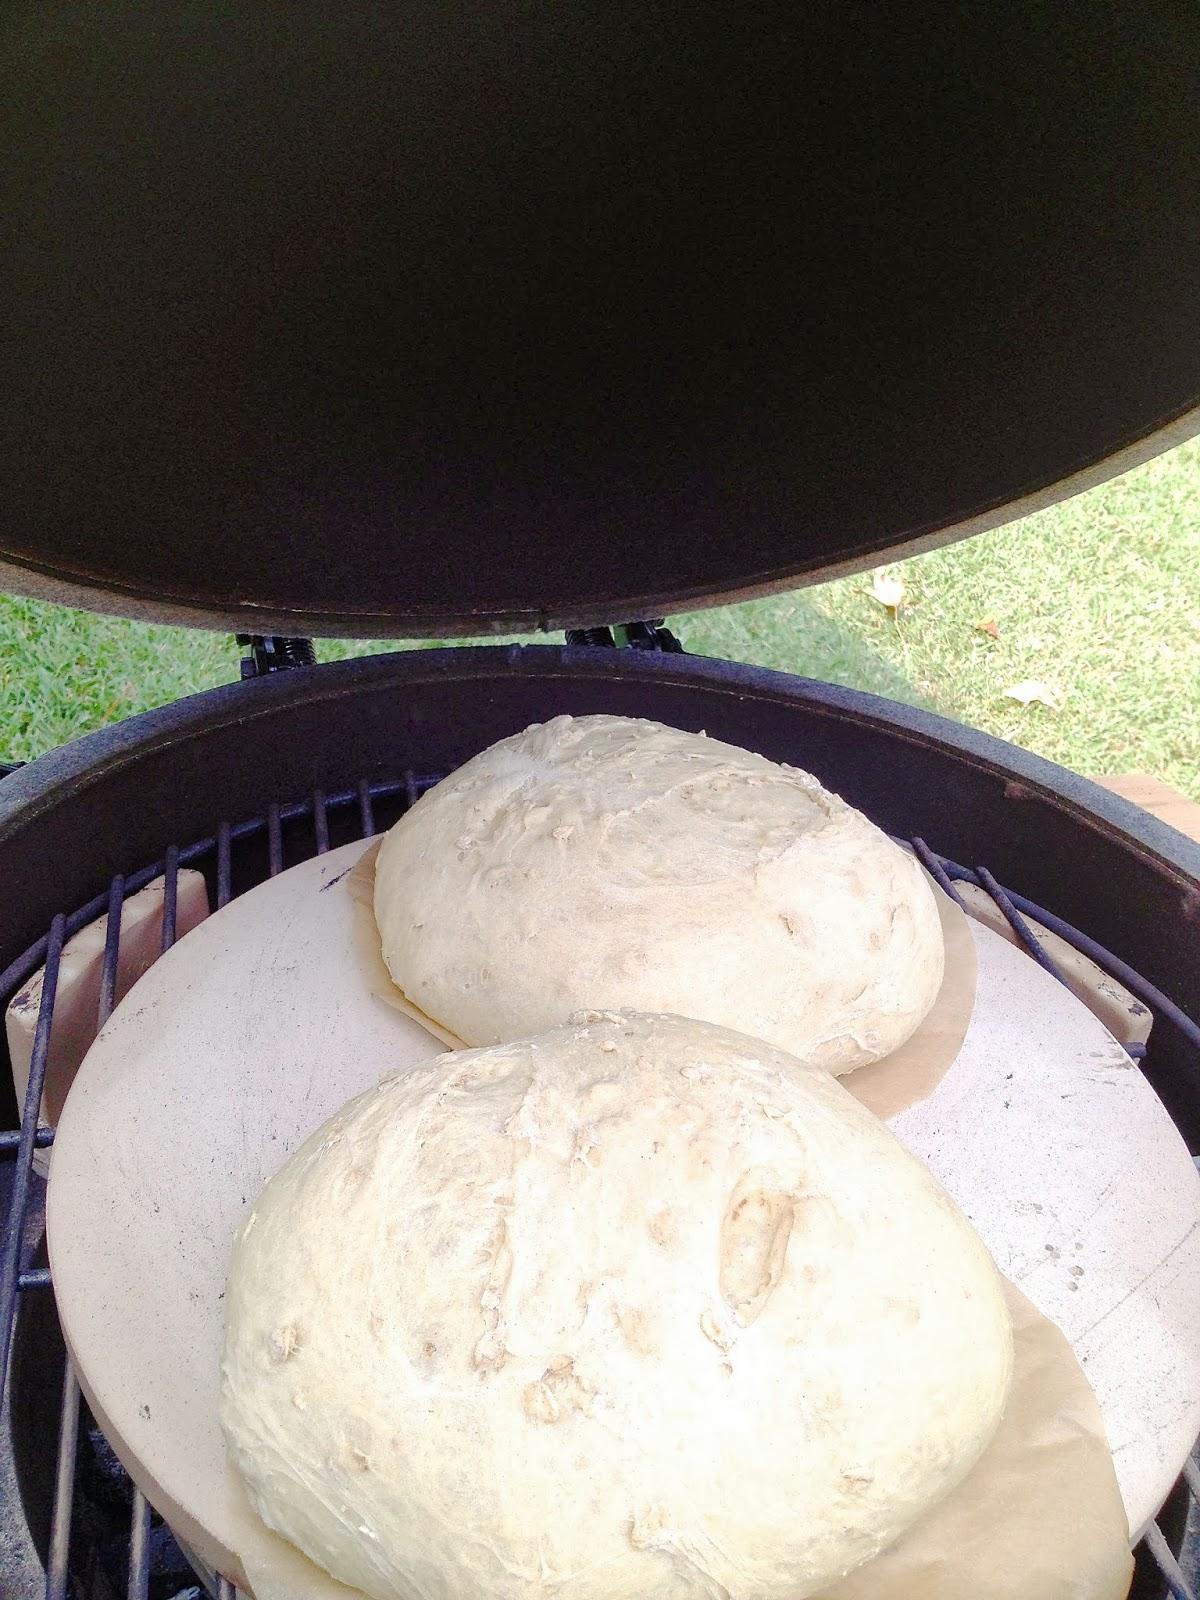 Flannel Jammies Farm: baking bread in the Big Green Egg  #856F46